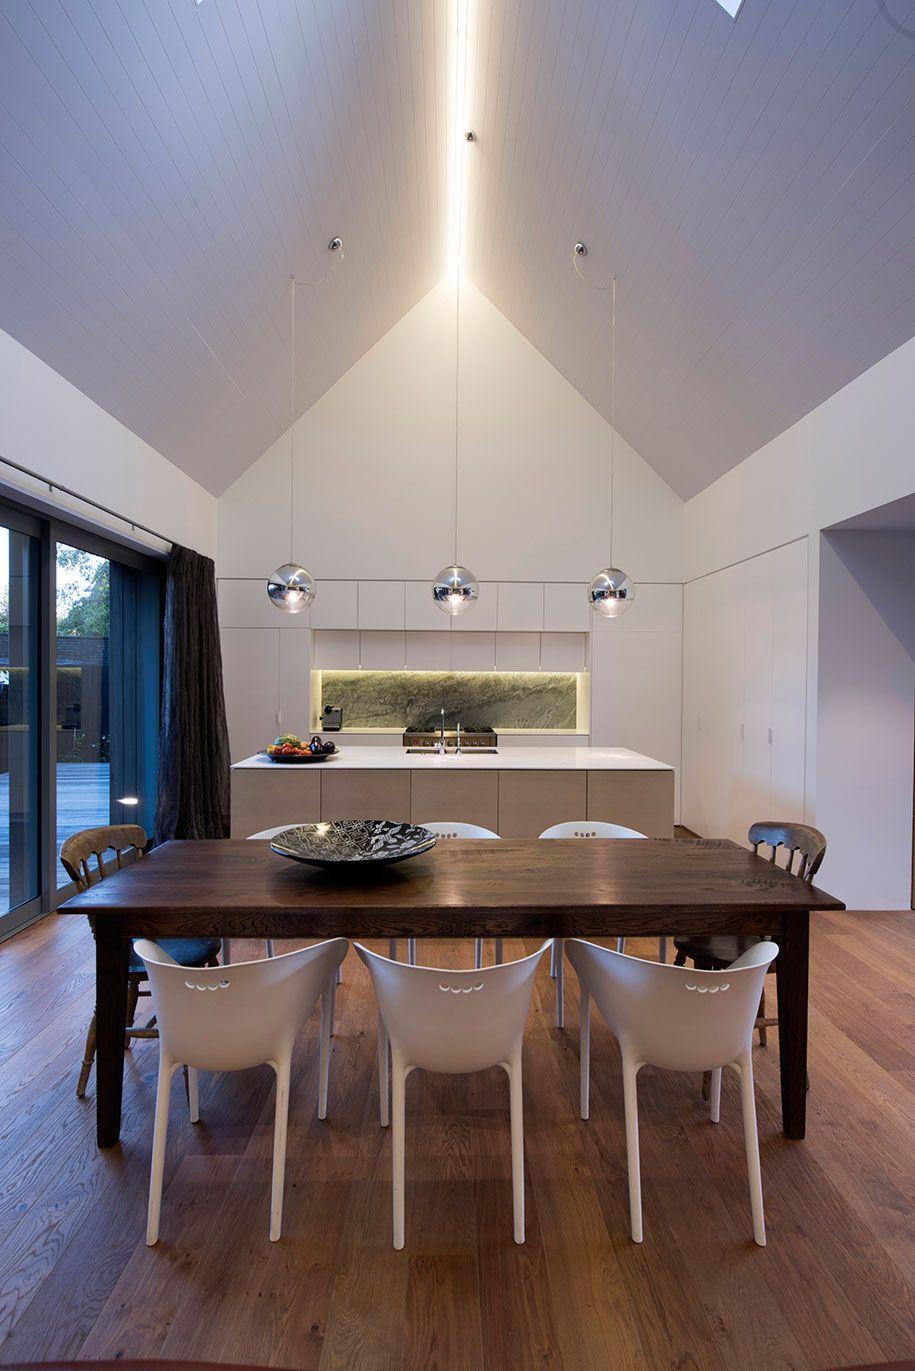 _scg4131   arquitectura   pinterest   beautiful kitchen, kitchens